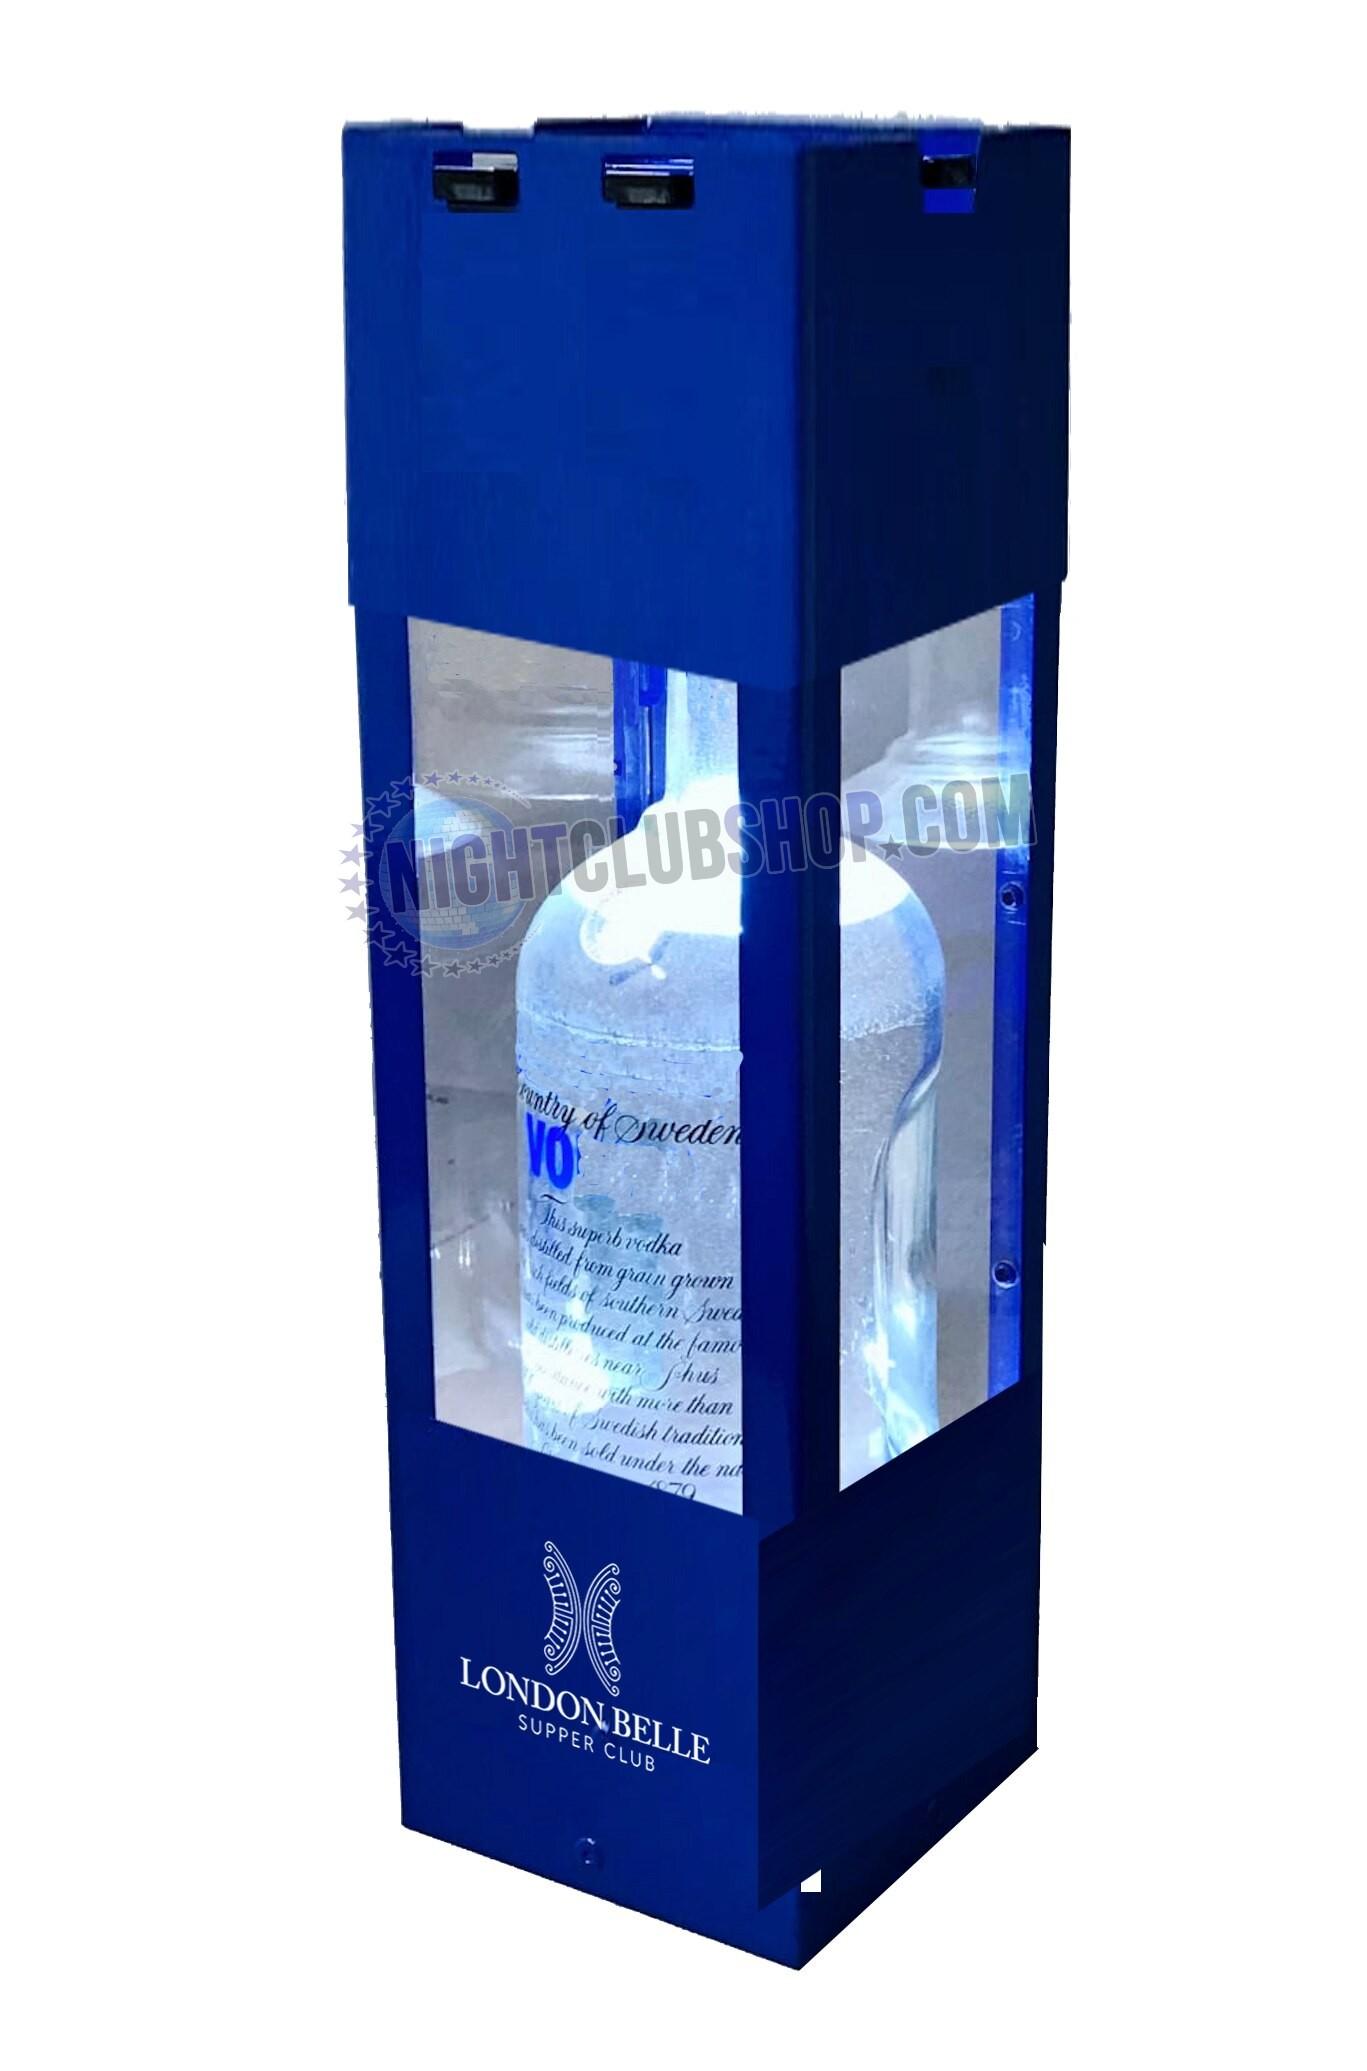 1-tagged-londonbelle-bottle-cage-lockblank-acrylic-rectangular-bottle-lock-cage-copy-1-.jpg